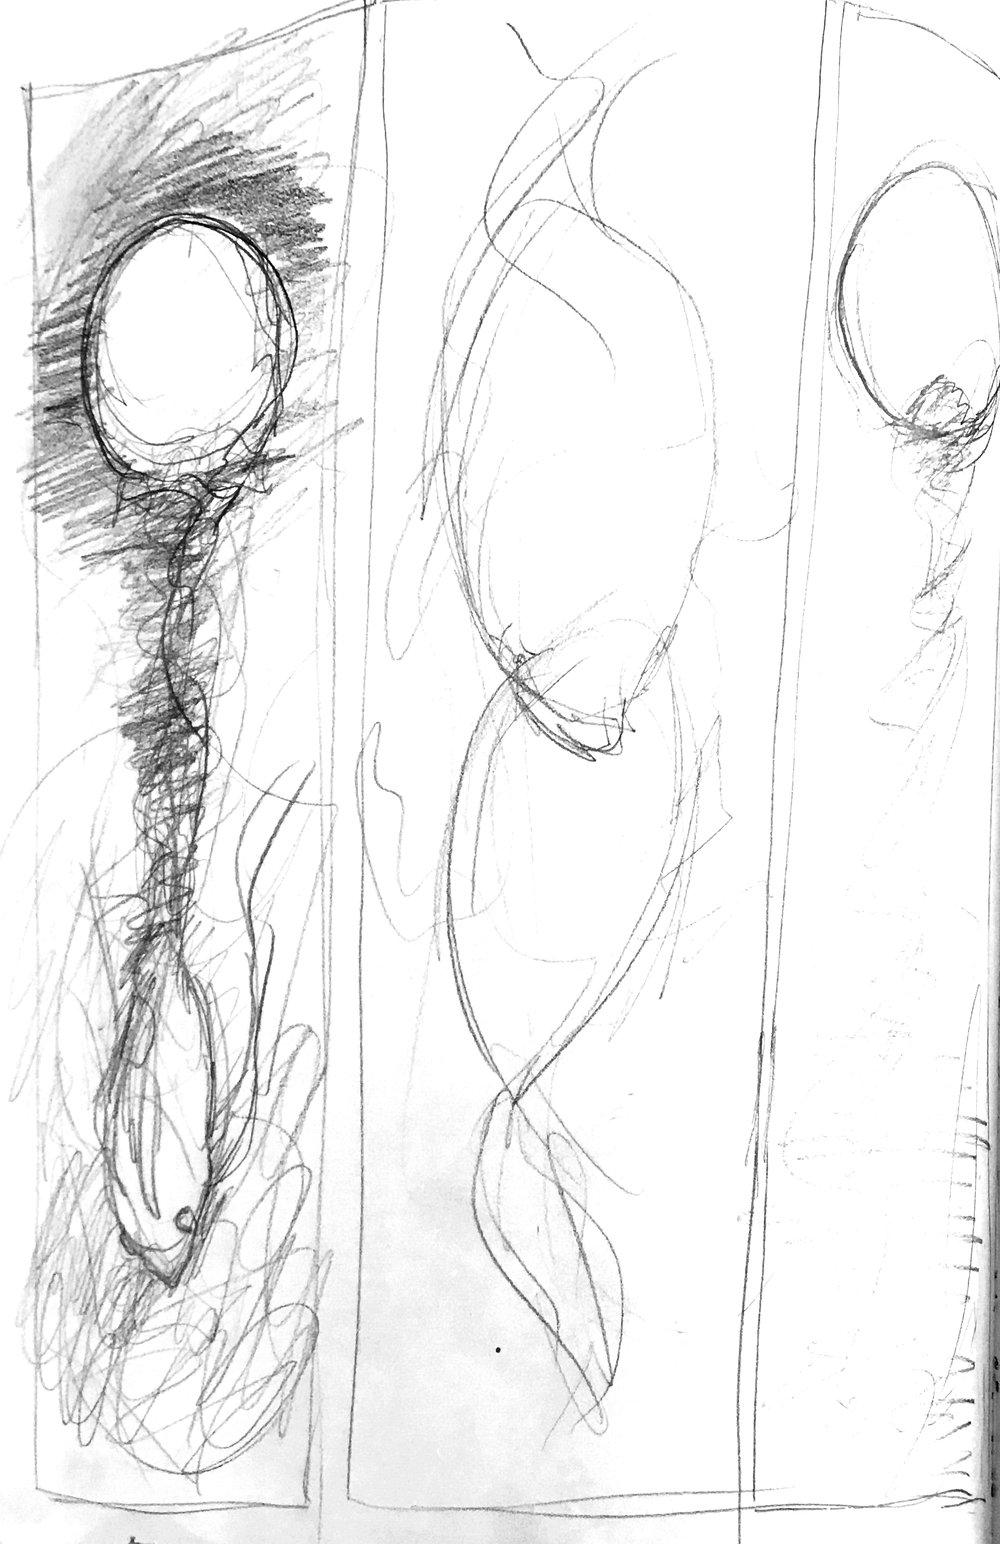 Sketch-Seascape-4.jpg